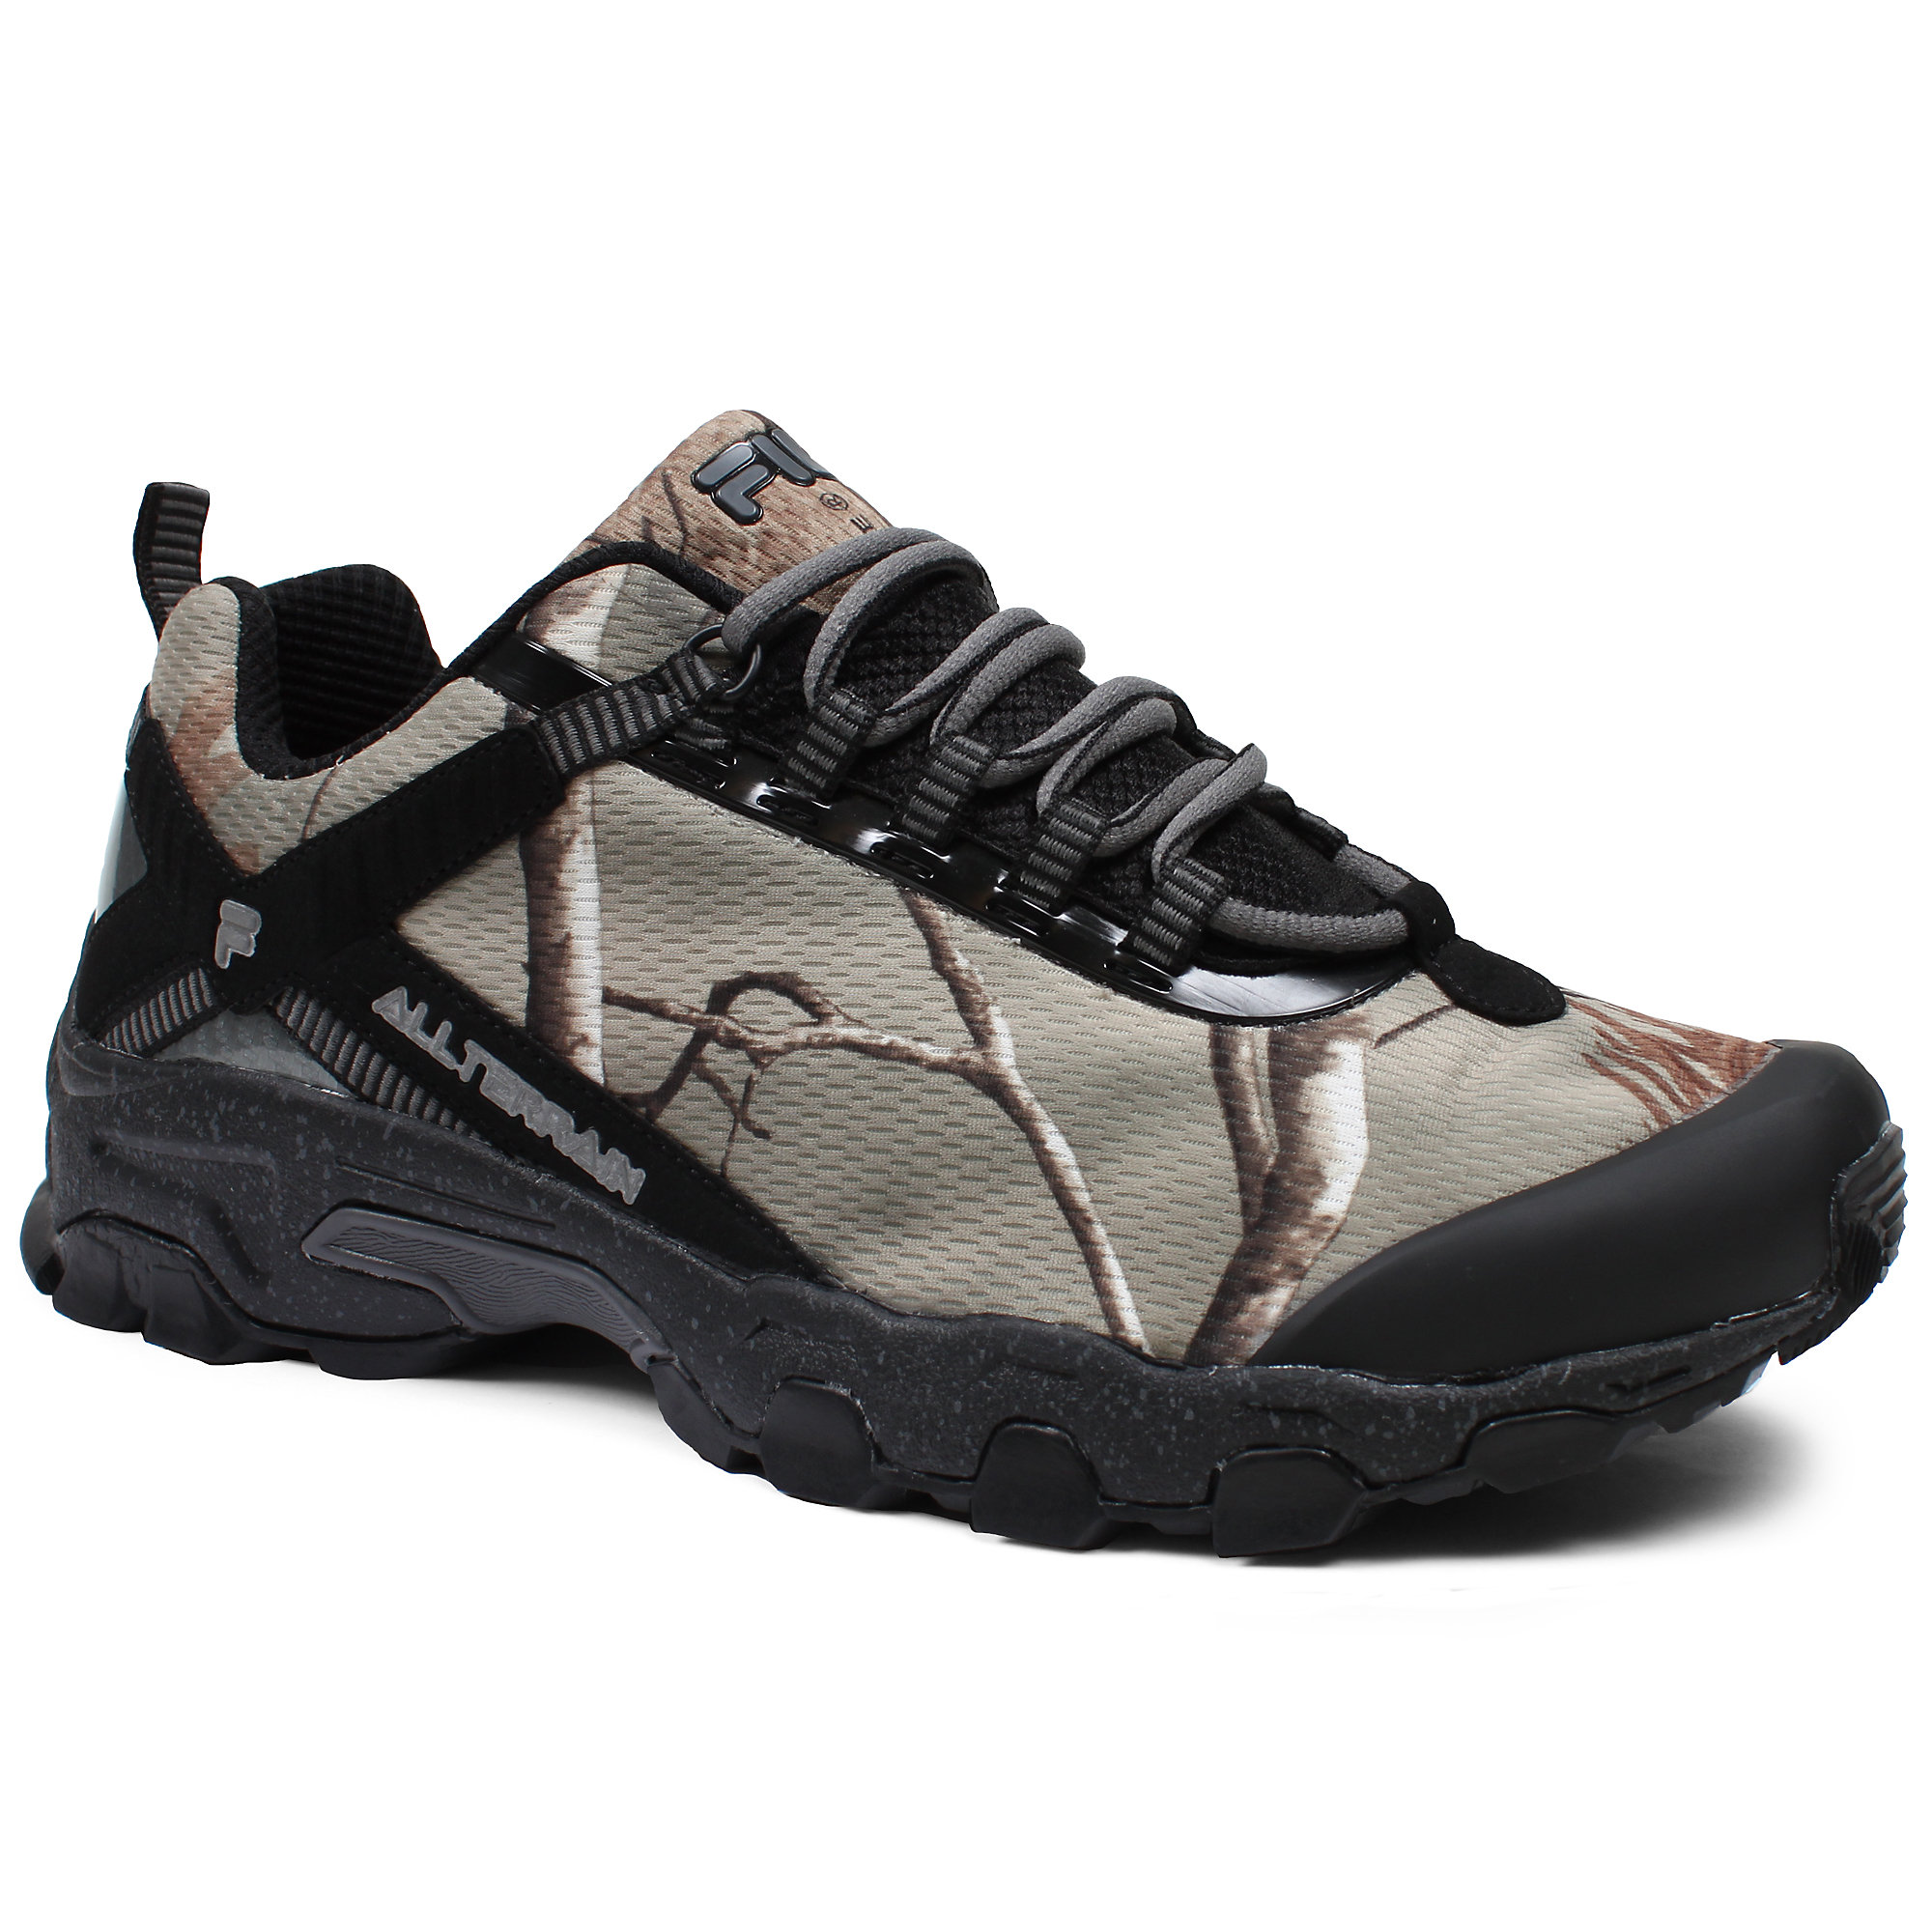 FILA-Men-039-s-Blowout-Camo-Trail-Shoes